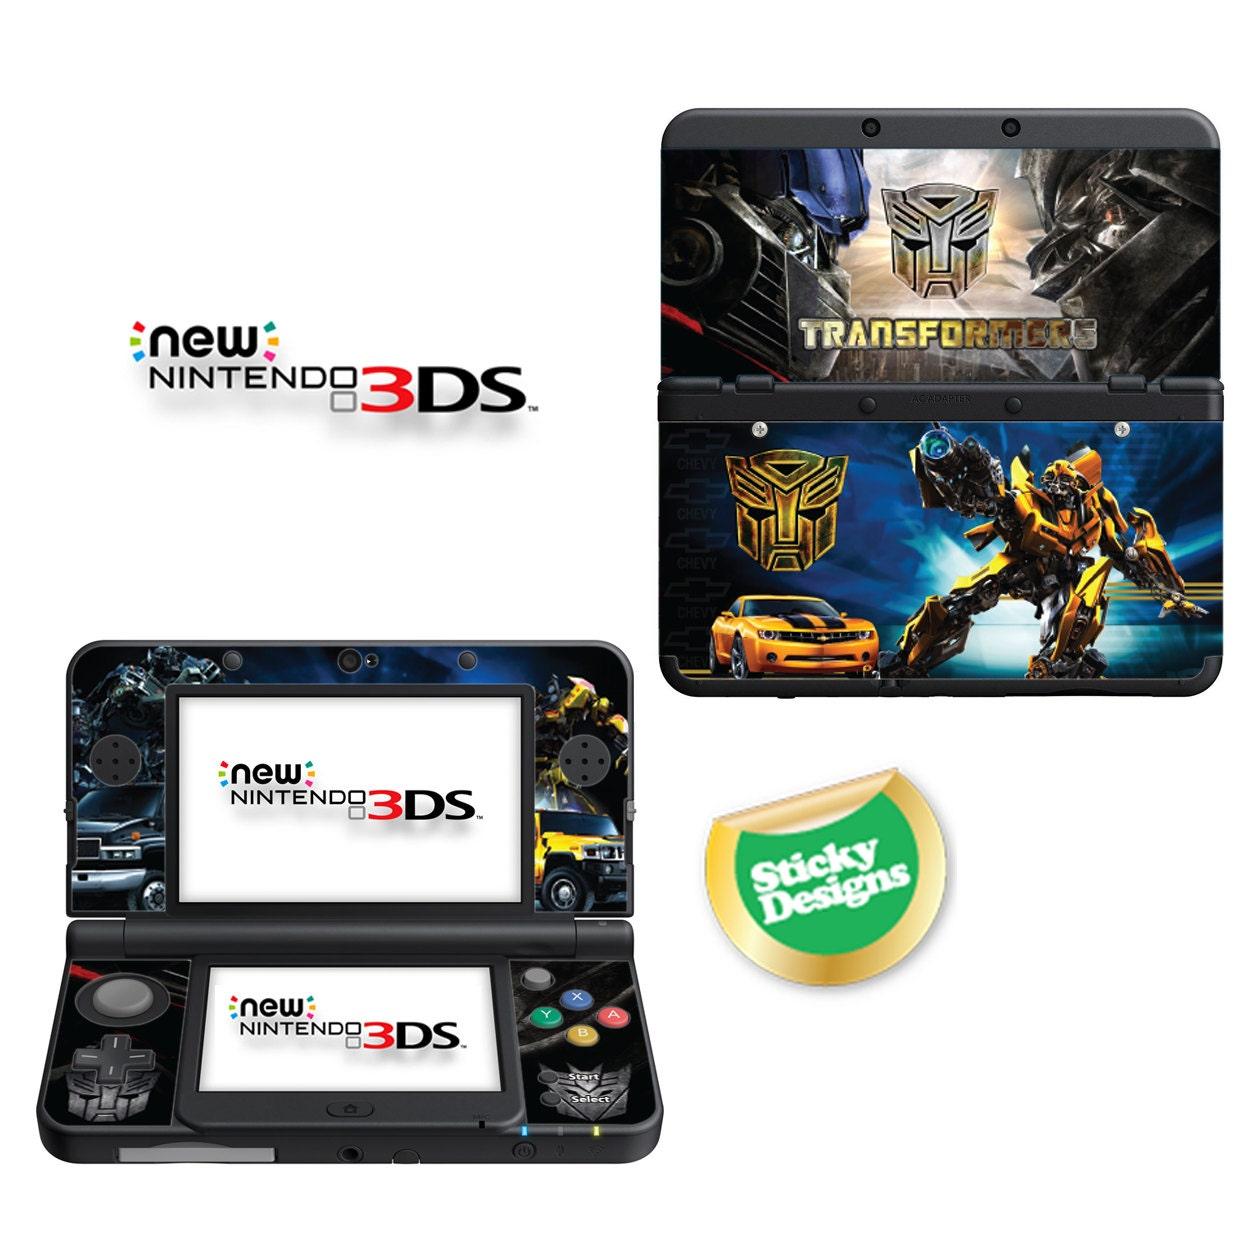 Transformers Vinyl Skin Sticker for Nintendo DS liteDSiDSi xl3DS3DS xlNew 3DS cstickNew 3DS xl cstick2DS